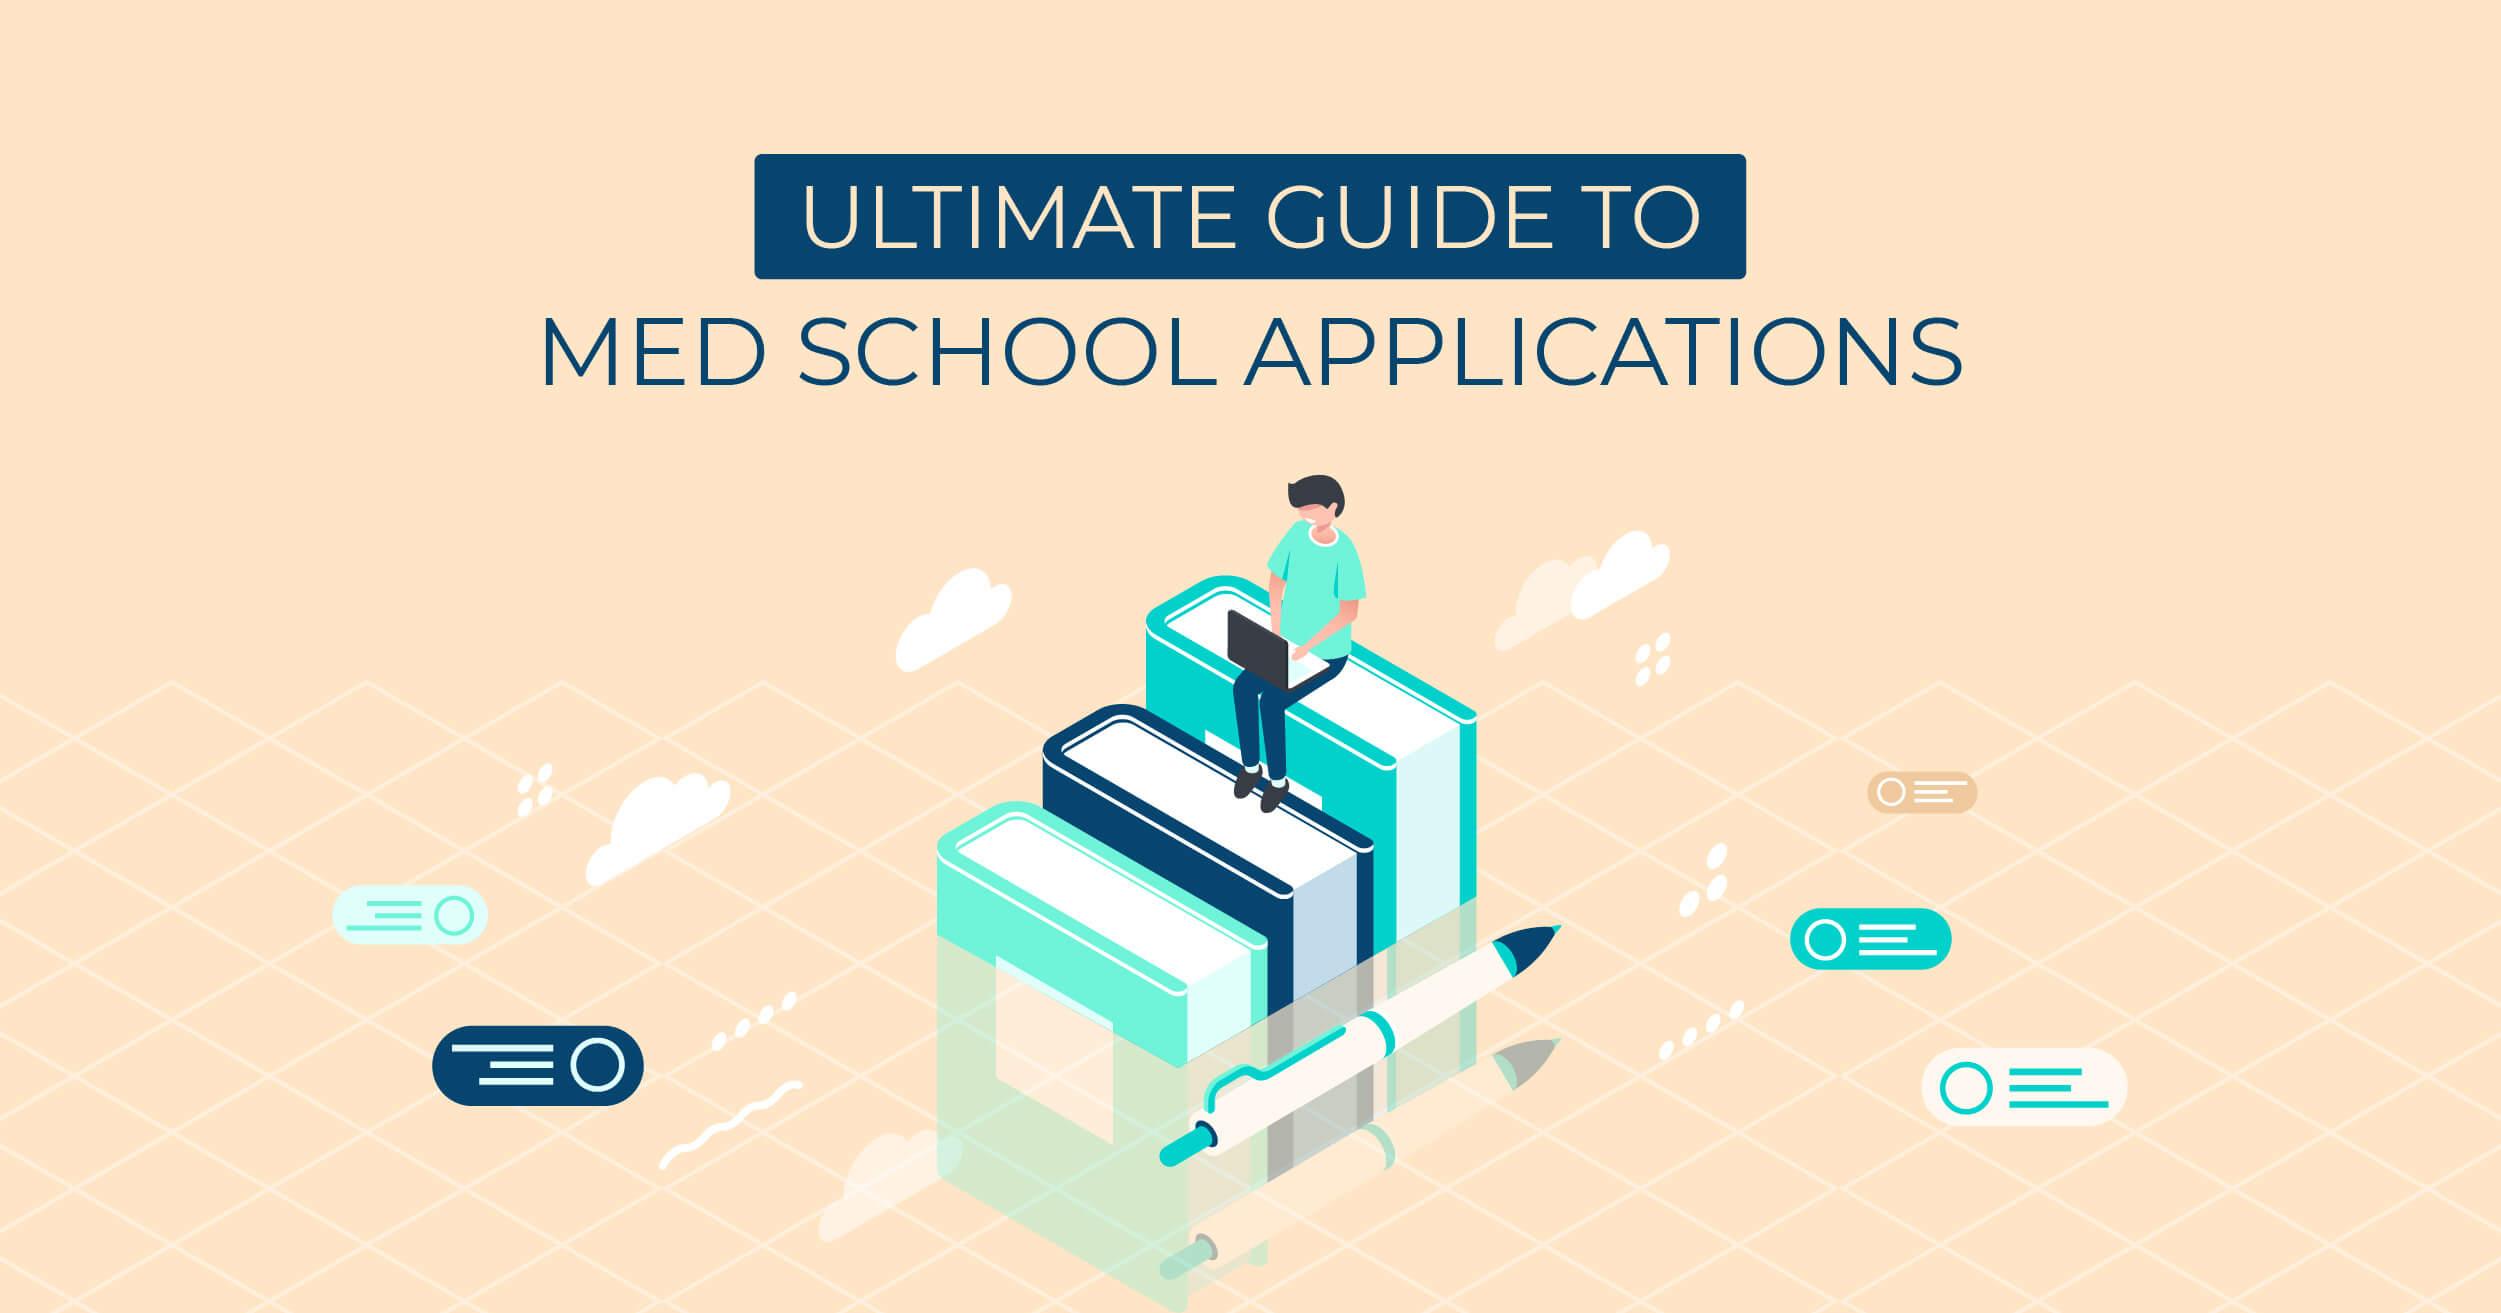 gamsat applications guide